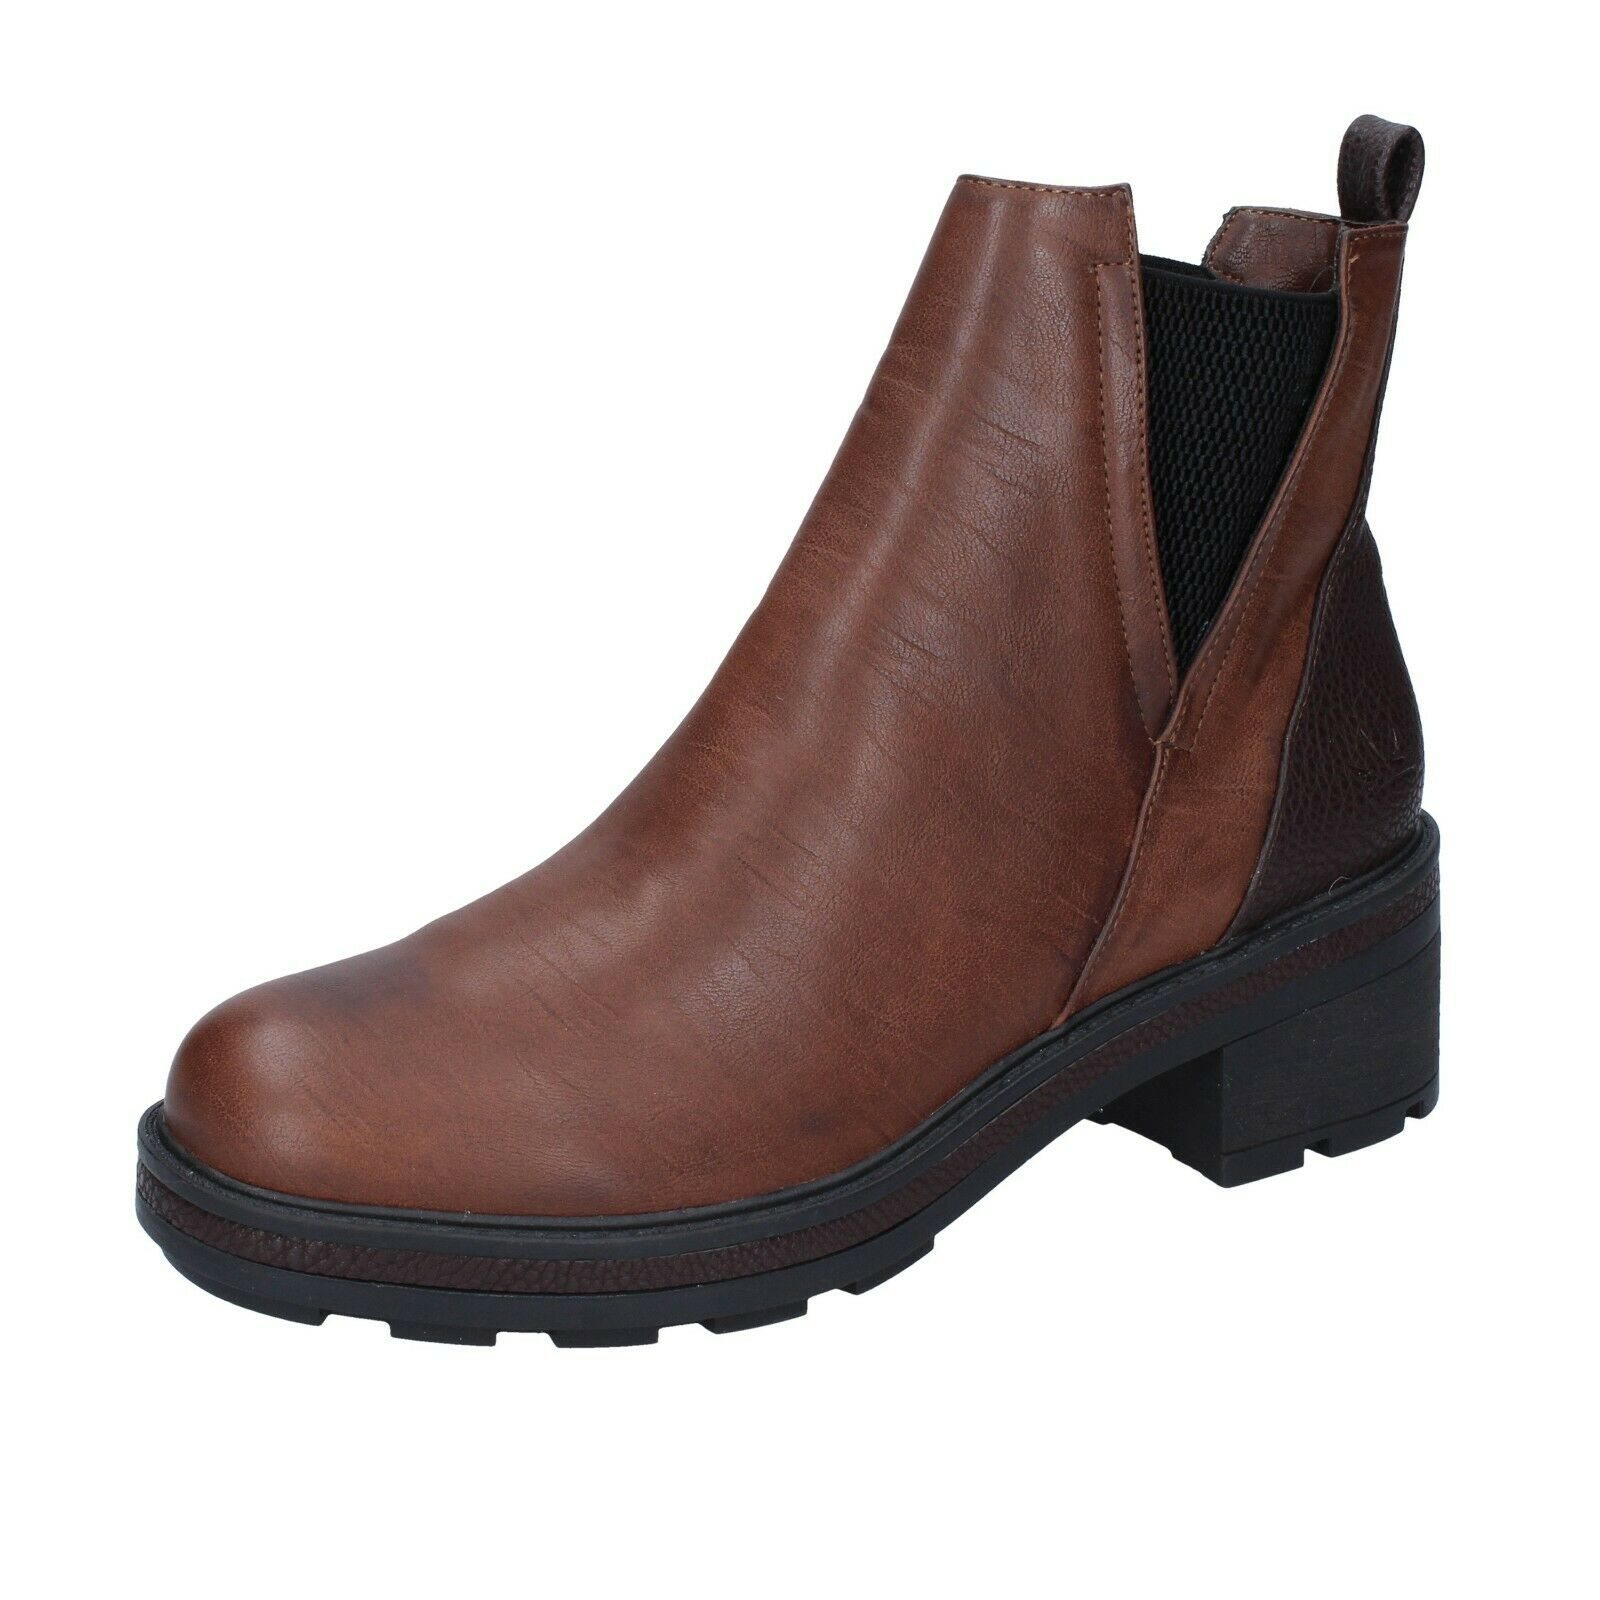 Femme chaussures Francesco Milano 8 (UE 41) Bottines en cuir marron BR37